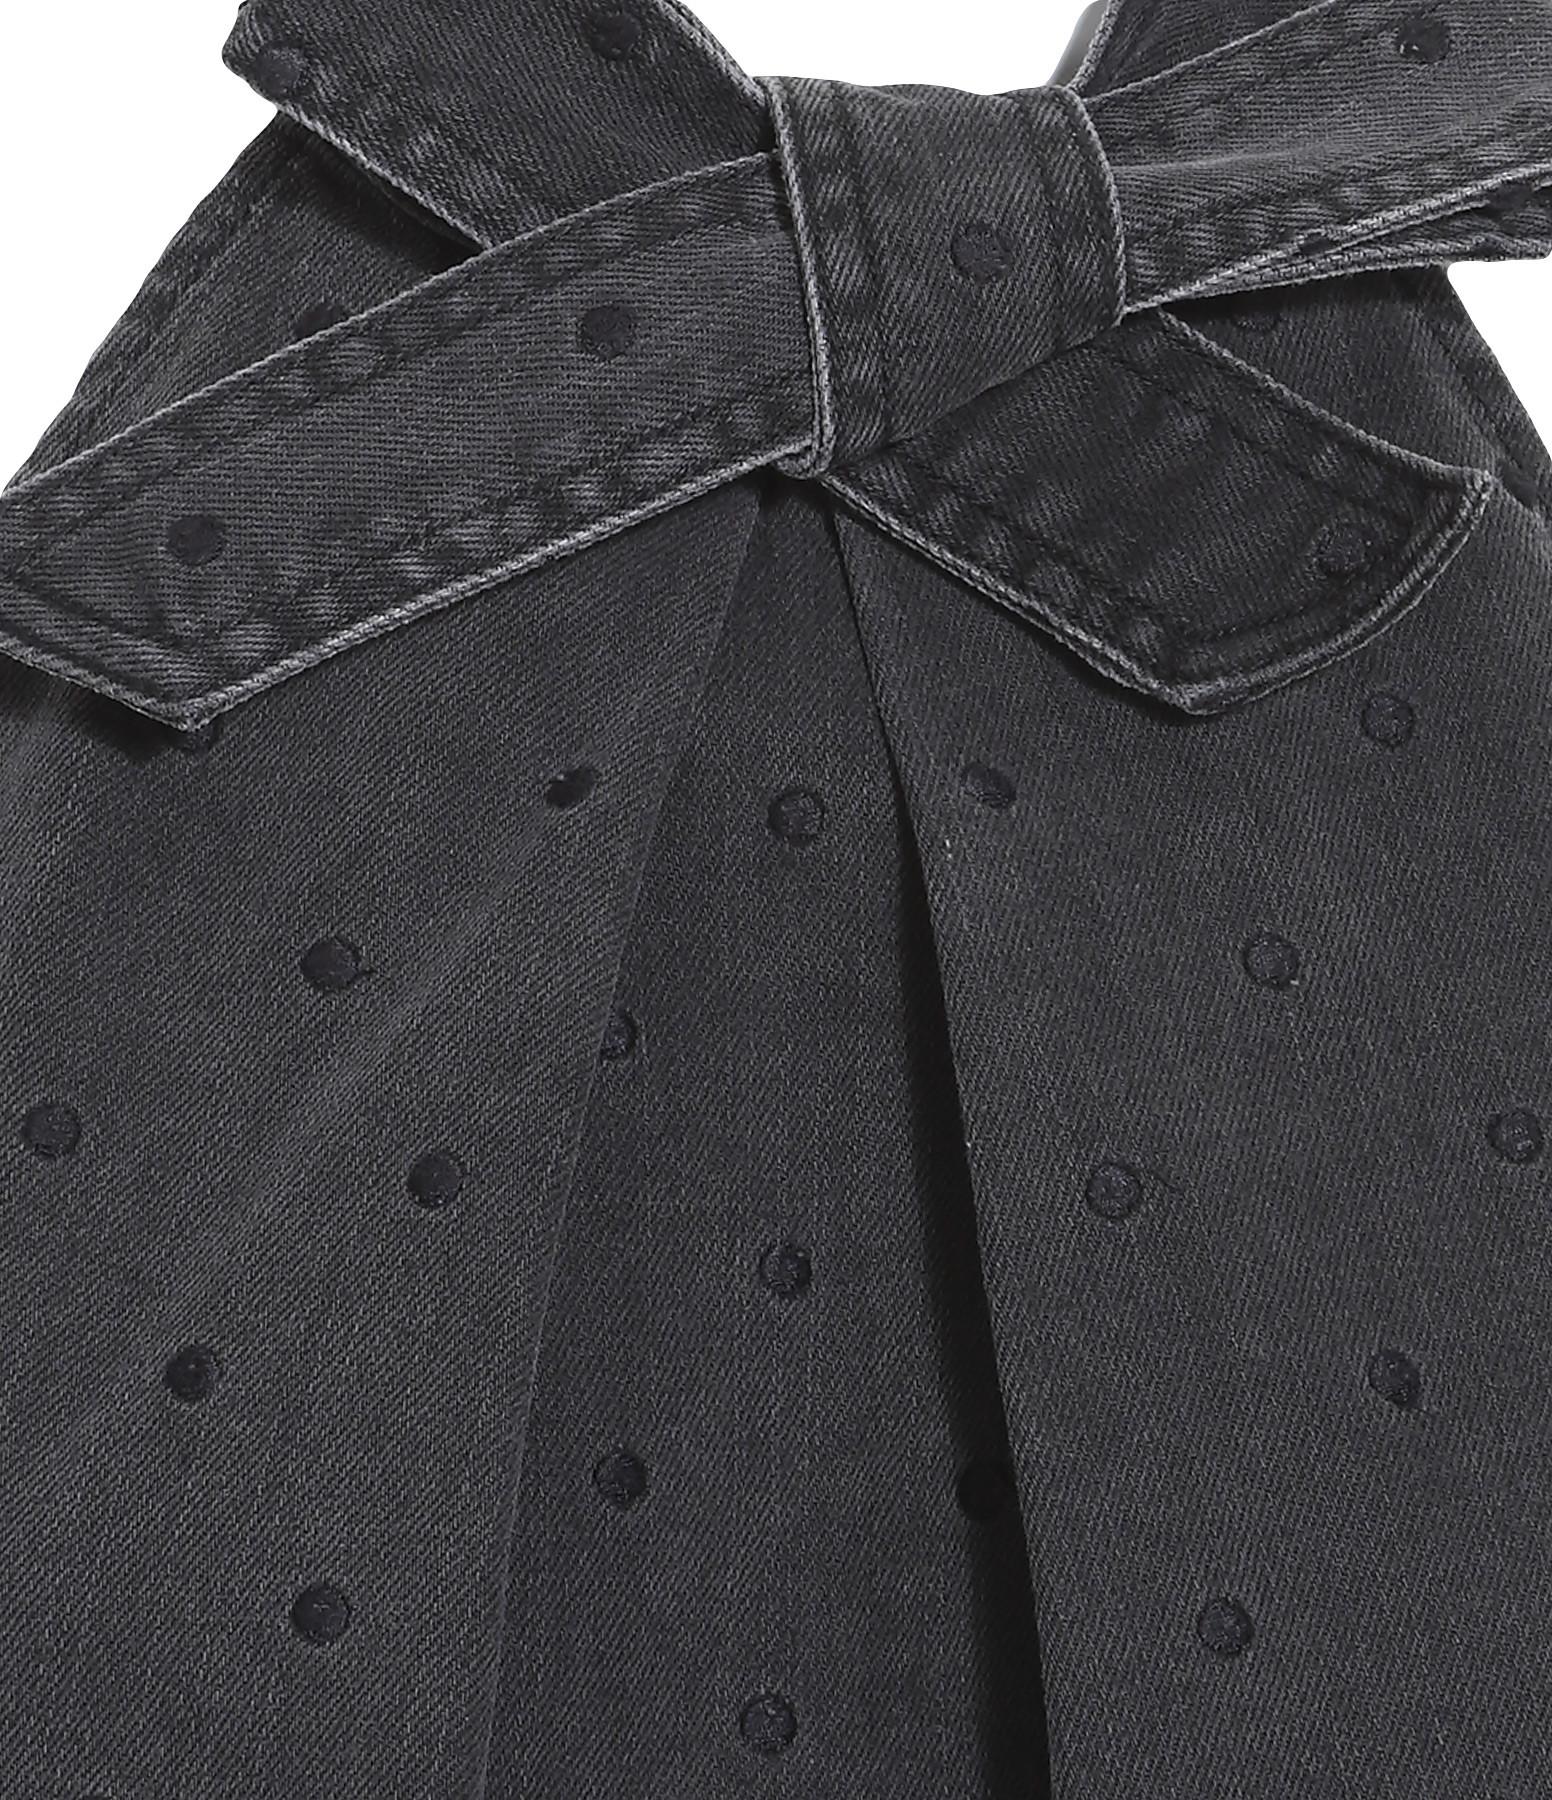 ULLAJOHN - Top Mako Coton Noir